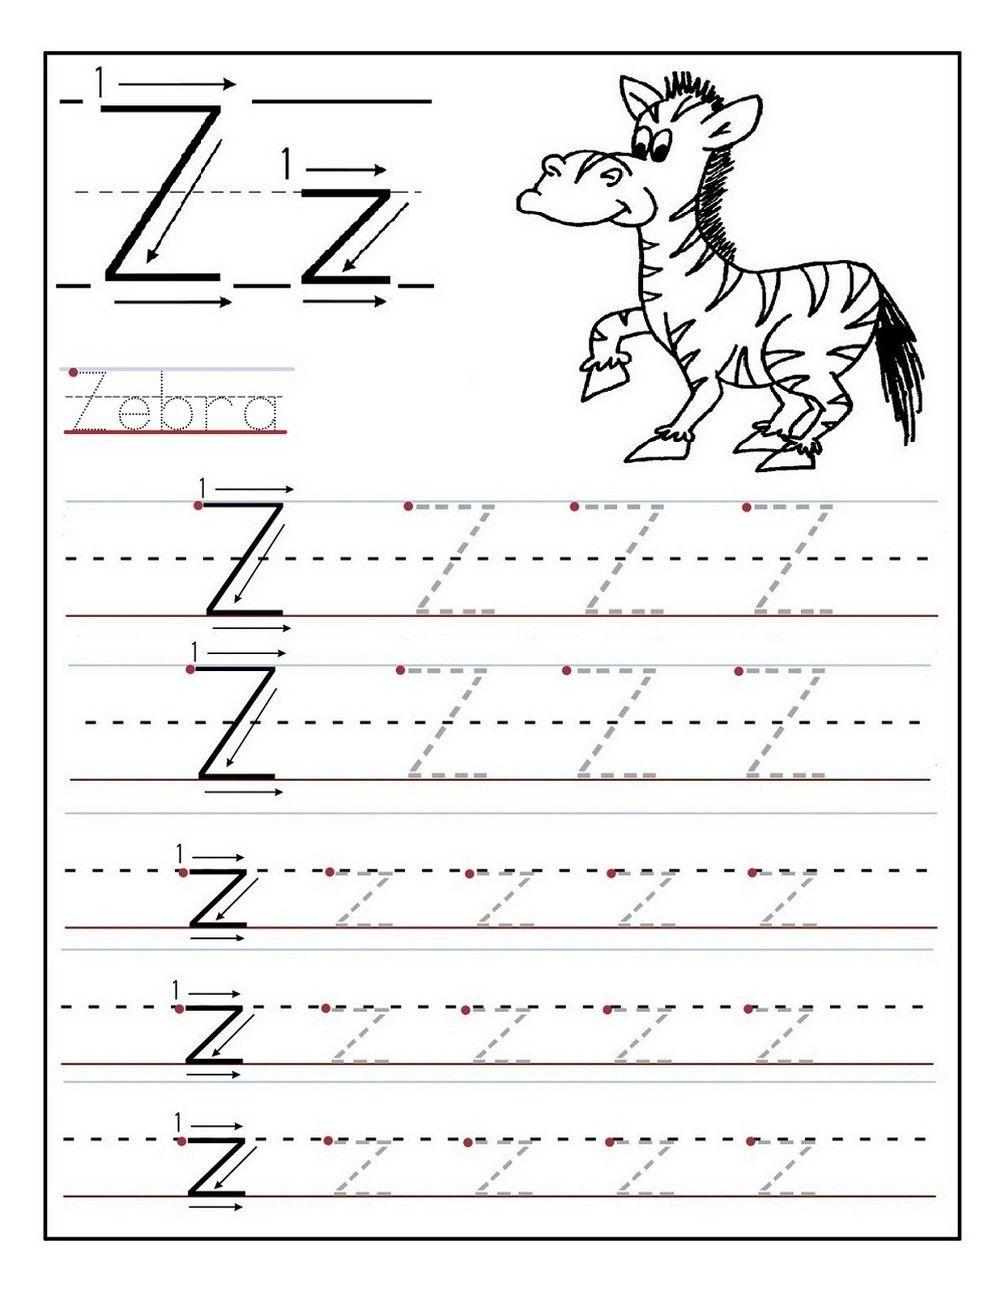 Kindergarten Letter Tracing Worksheets Tracing Worksheets Preschool Preschool Worksheets Tracing Worksheets [ 1300 x 1005 Pixel ]